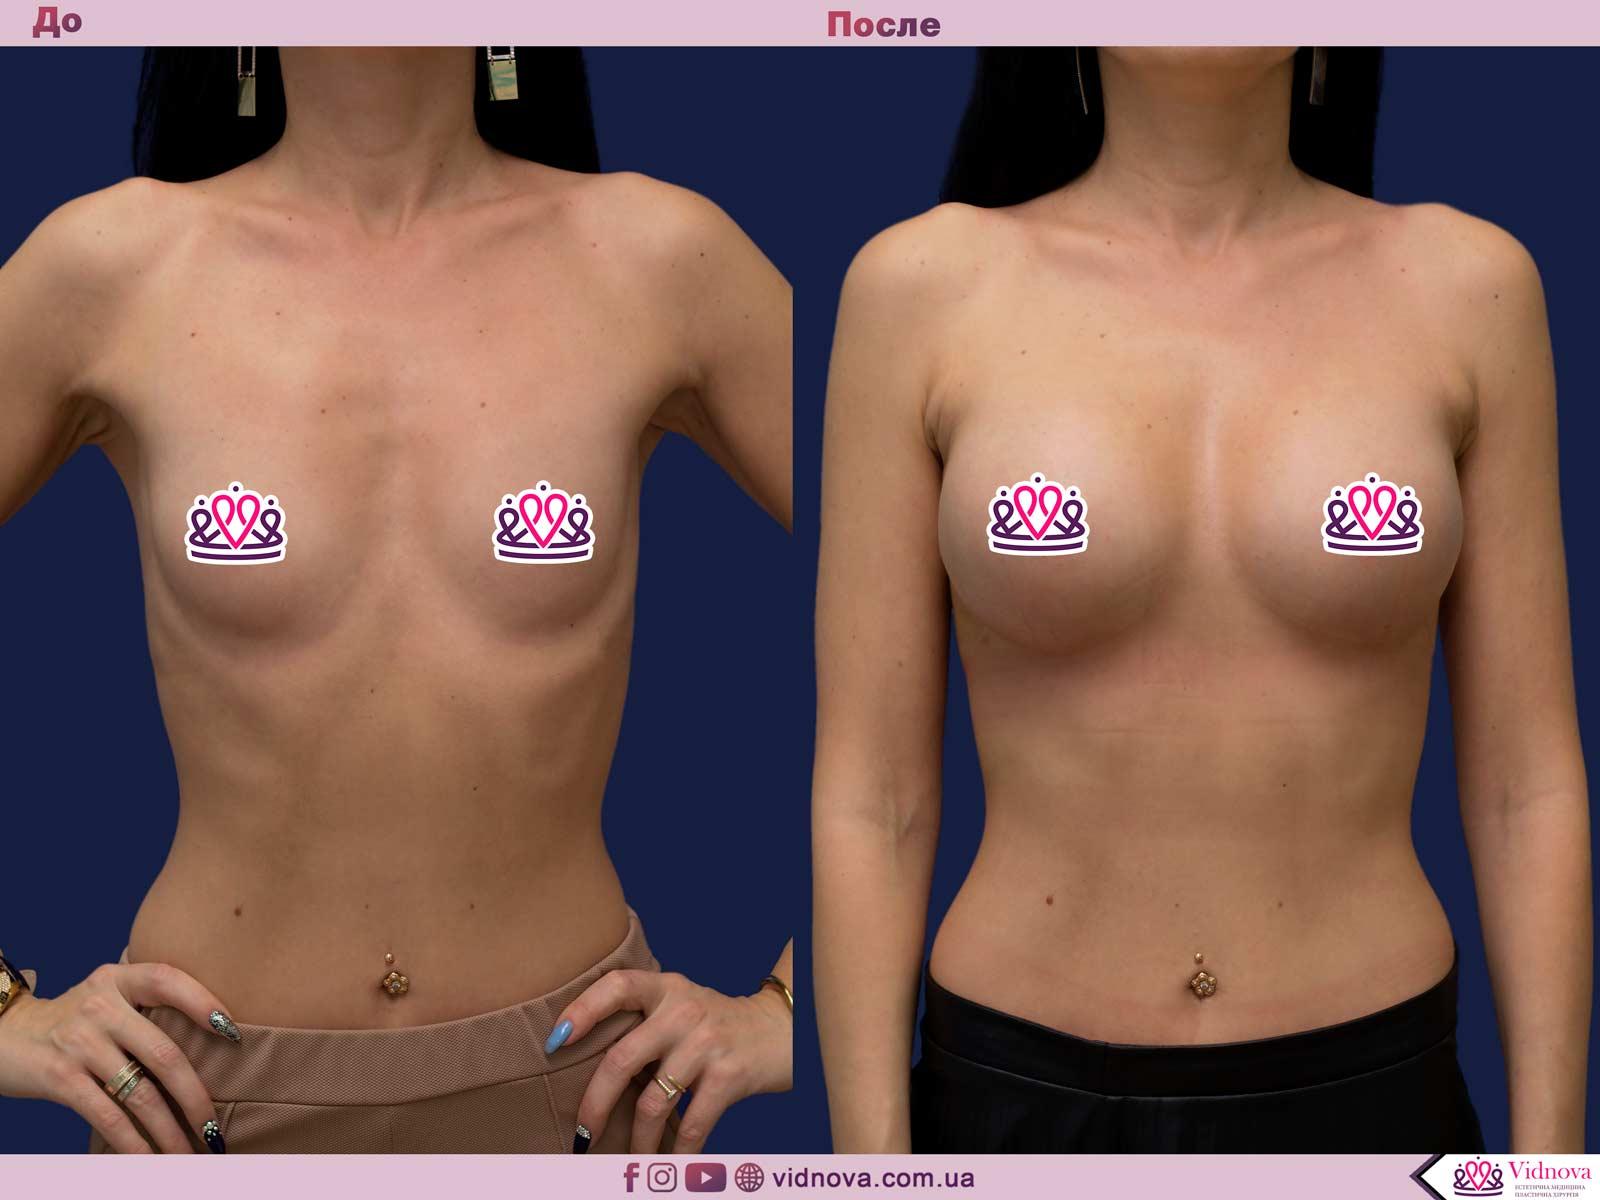 Увеличение груди: Фото ДО и ПОСЛЕ - Пример №80-1 - Клиника Vidnova